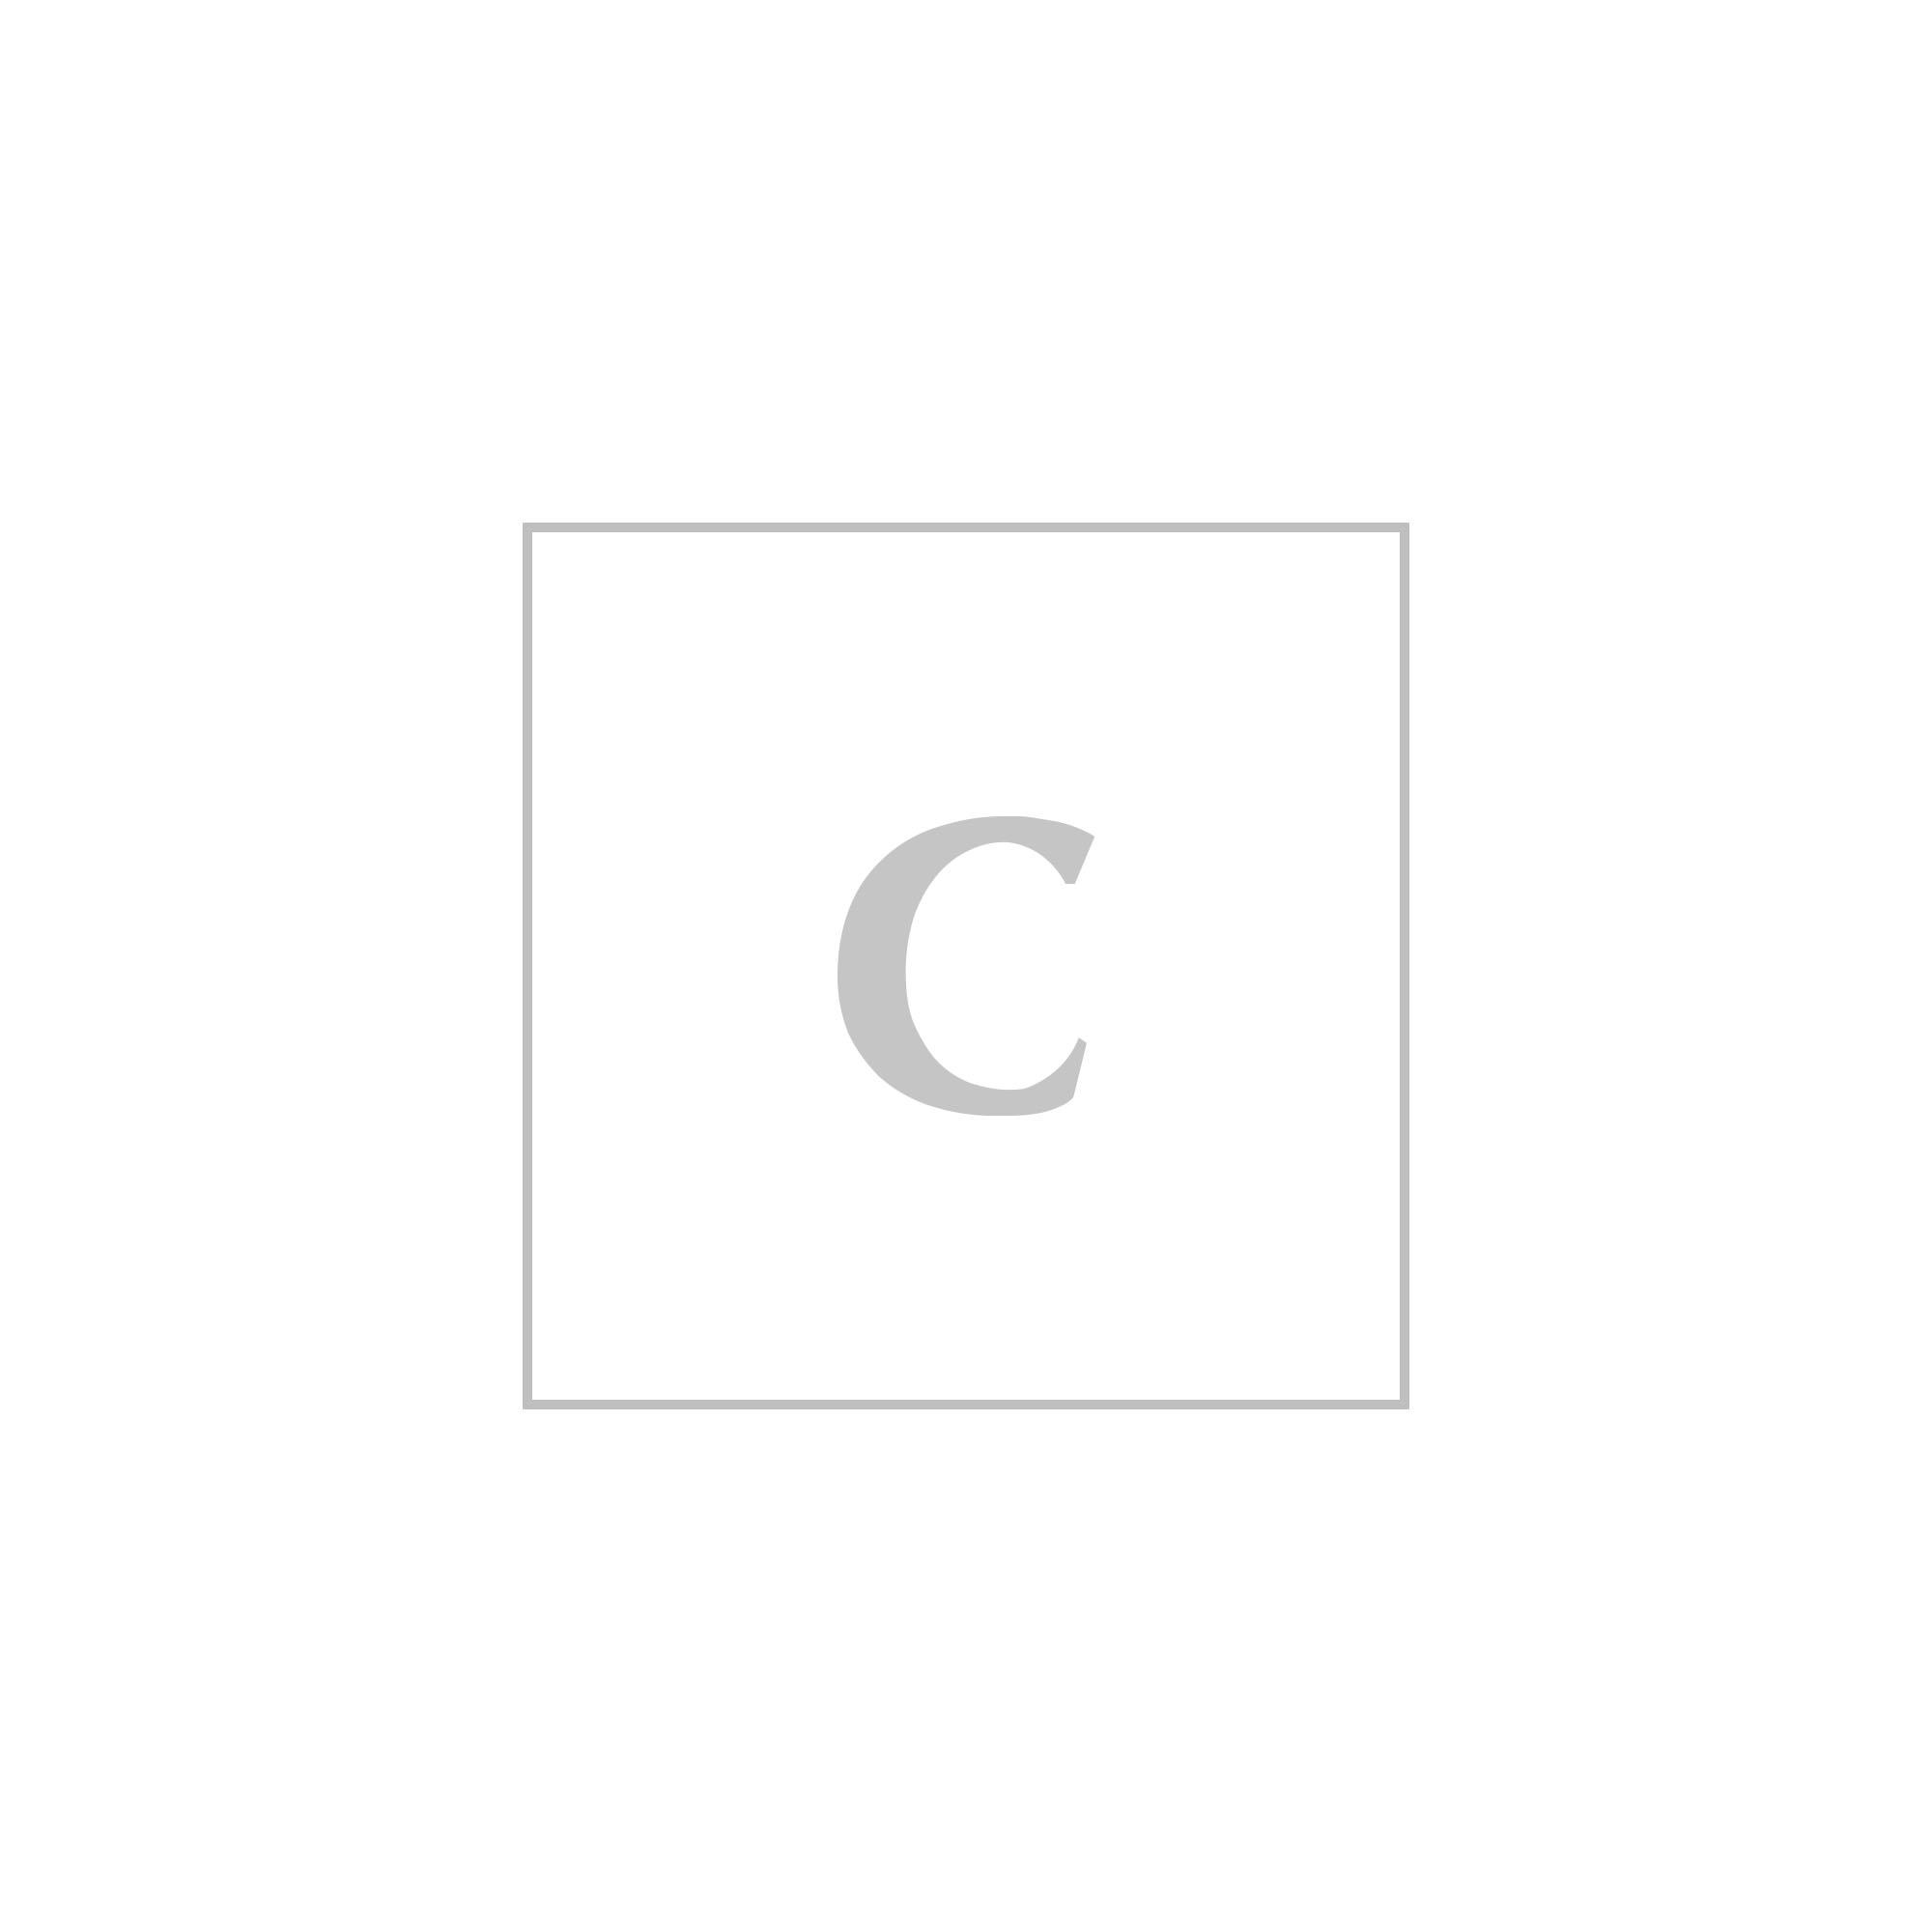 85338bab9772e4 Women Michael Kors Wallets Pink | Coltorti Boutique